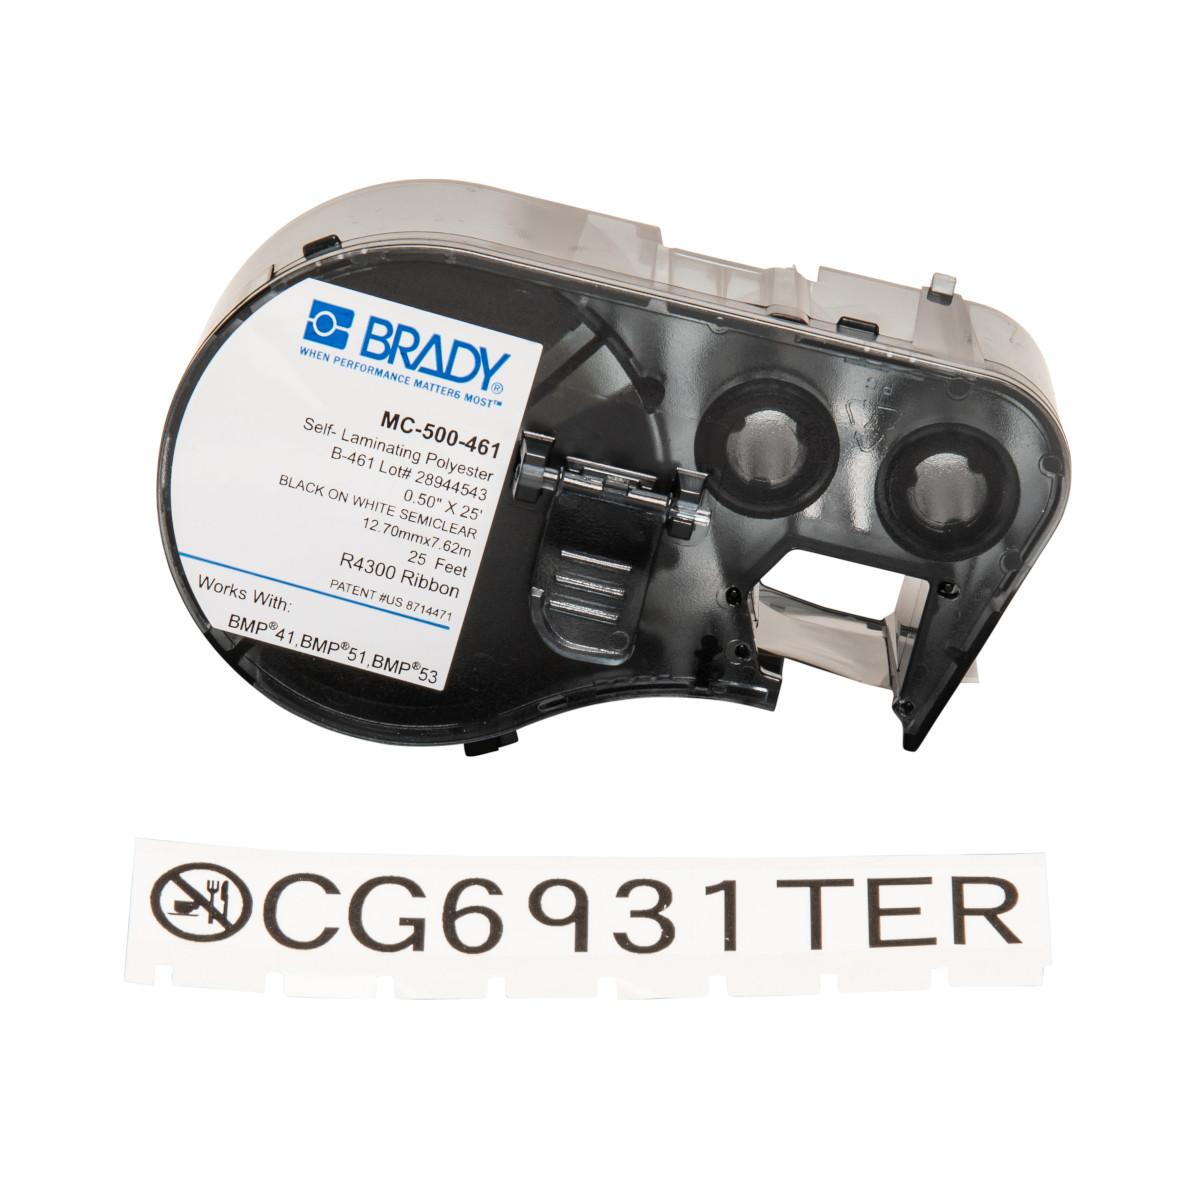 "BRADY MC-500-461 Label M SeriesB461.5""x25ft,Blk/Wht,1CQ"